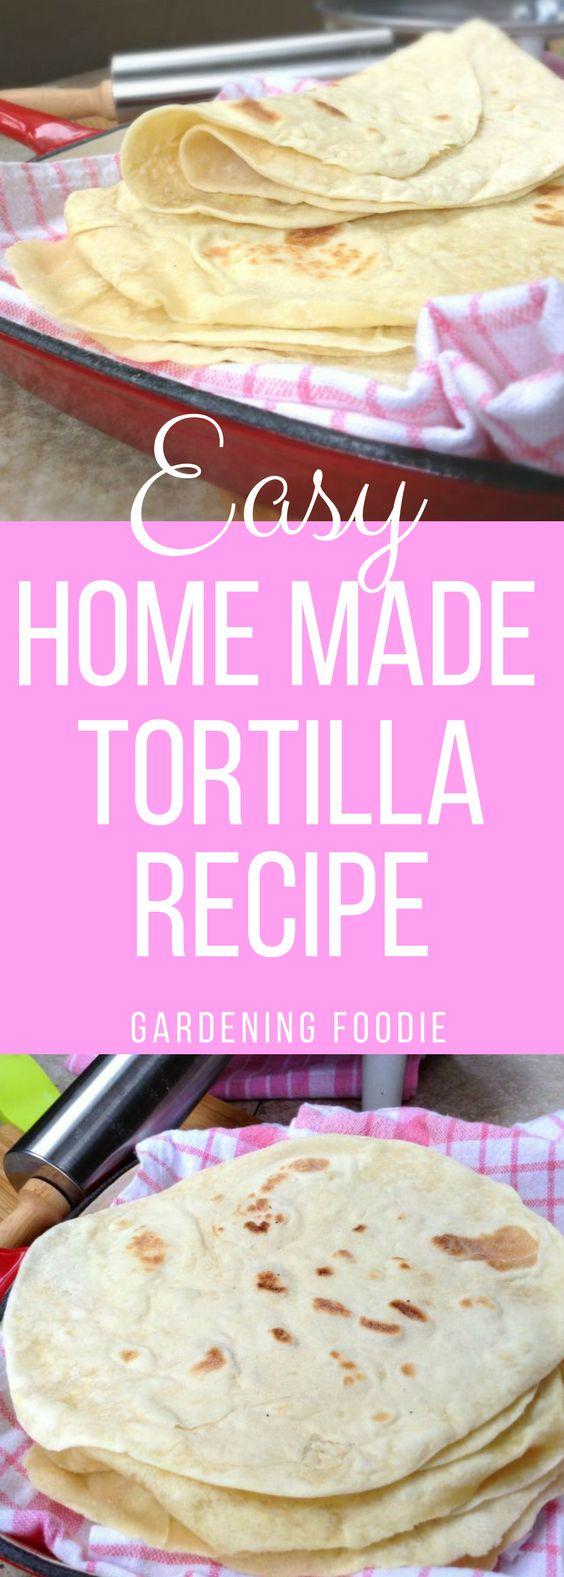 Easy Homemade Flour Tortilla Recipe ⋆ Gardening Foodie